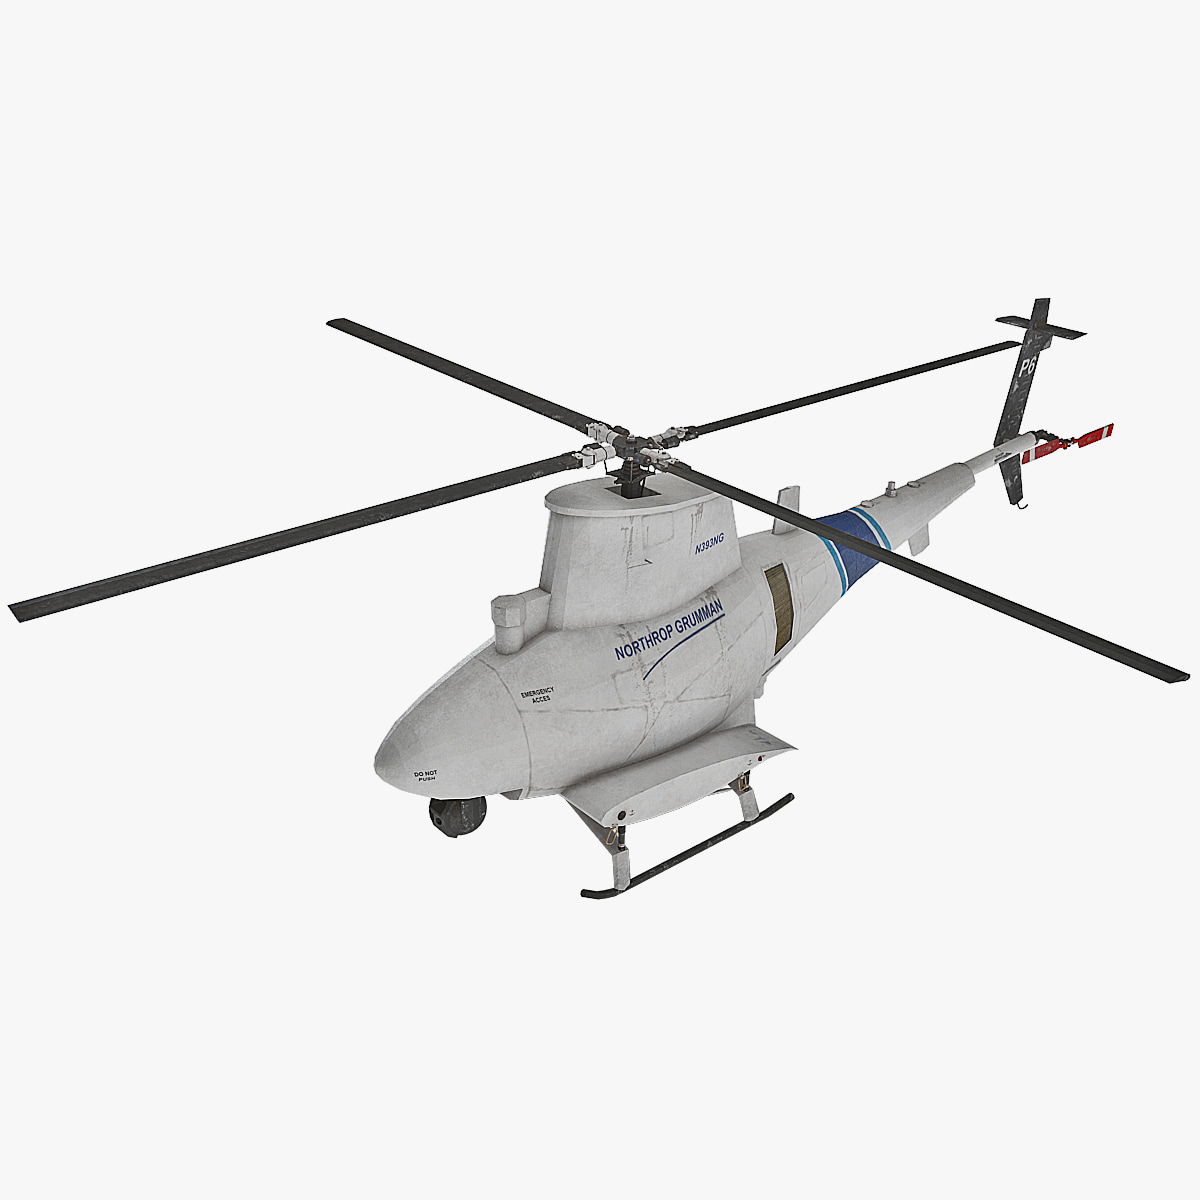 northrop grumman mq-8 scout 3d model